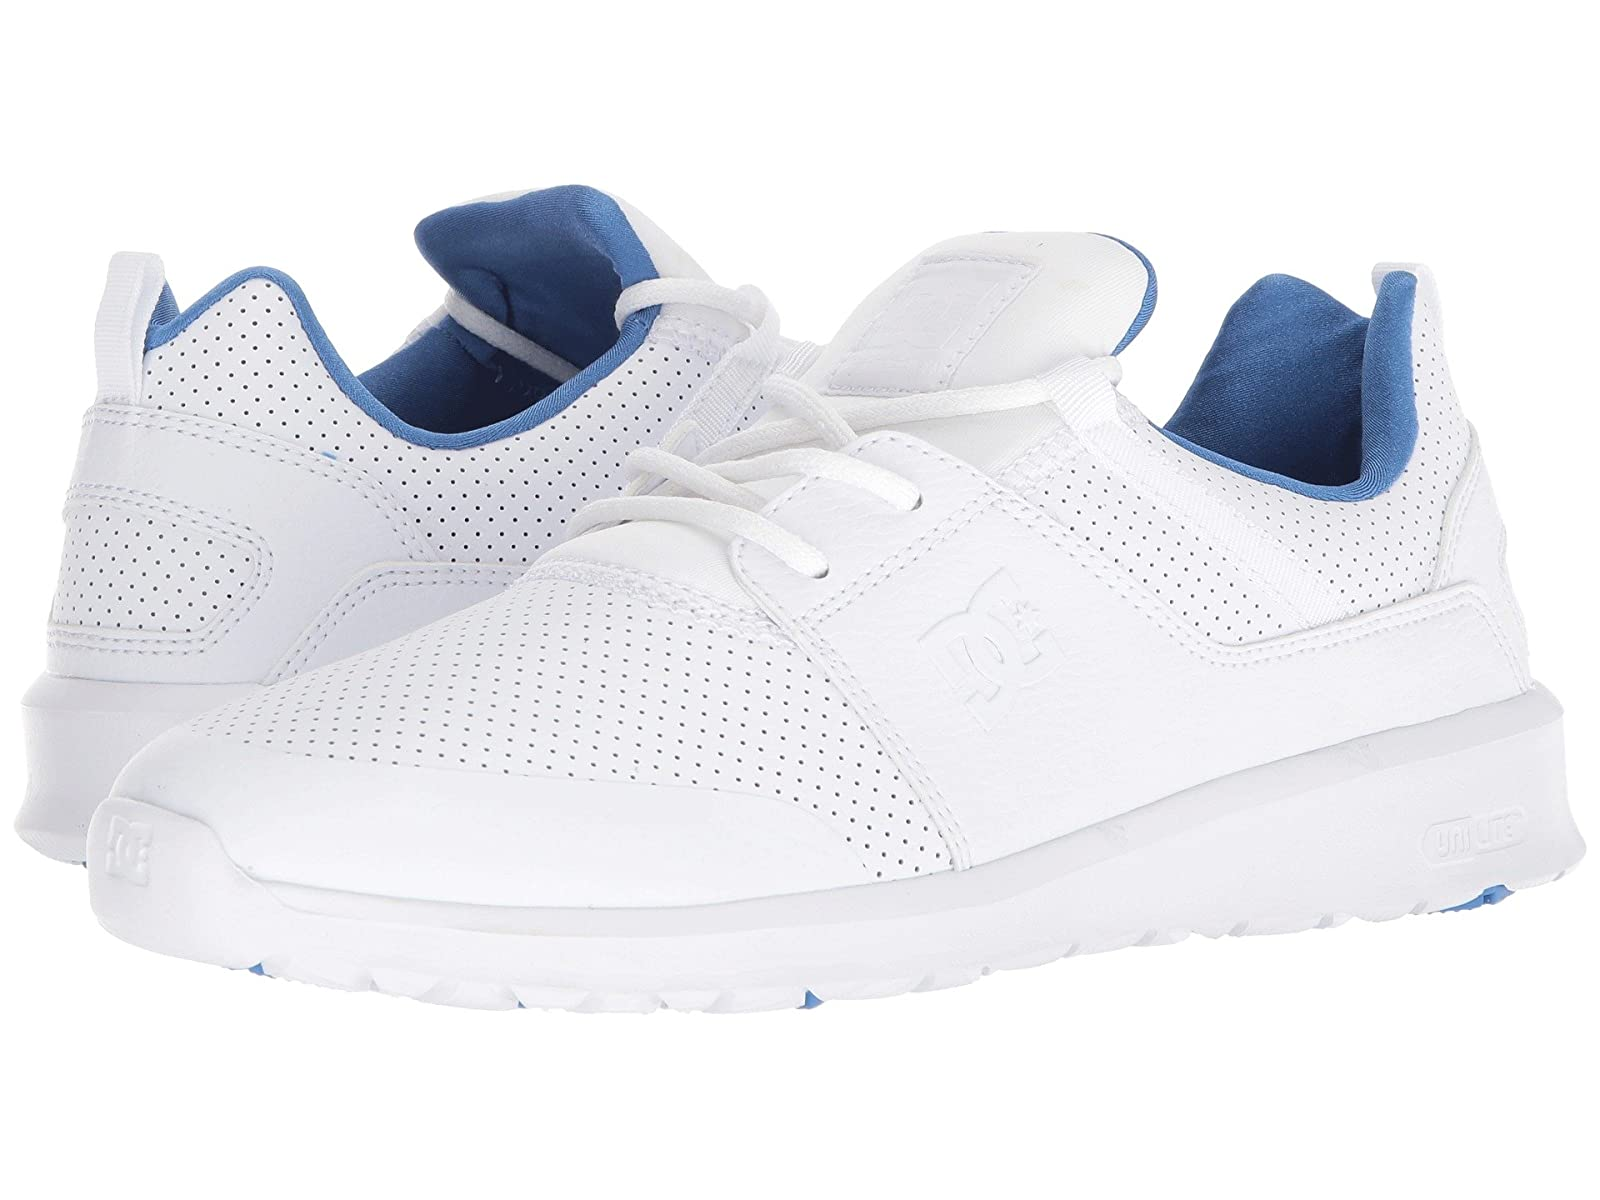 DC Heathrow PrestigeAtmospheric grades have affordable shoes